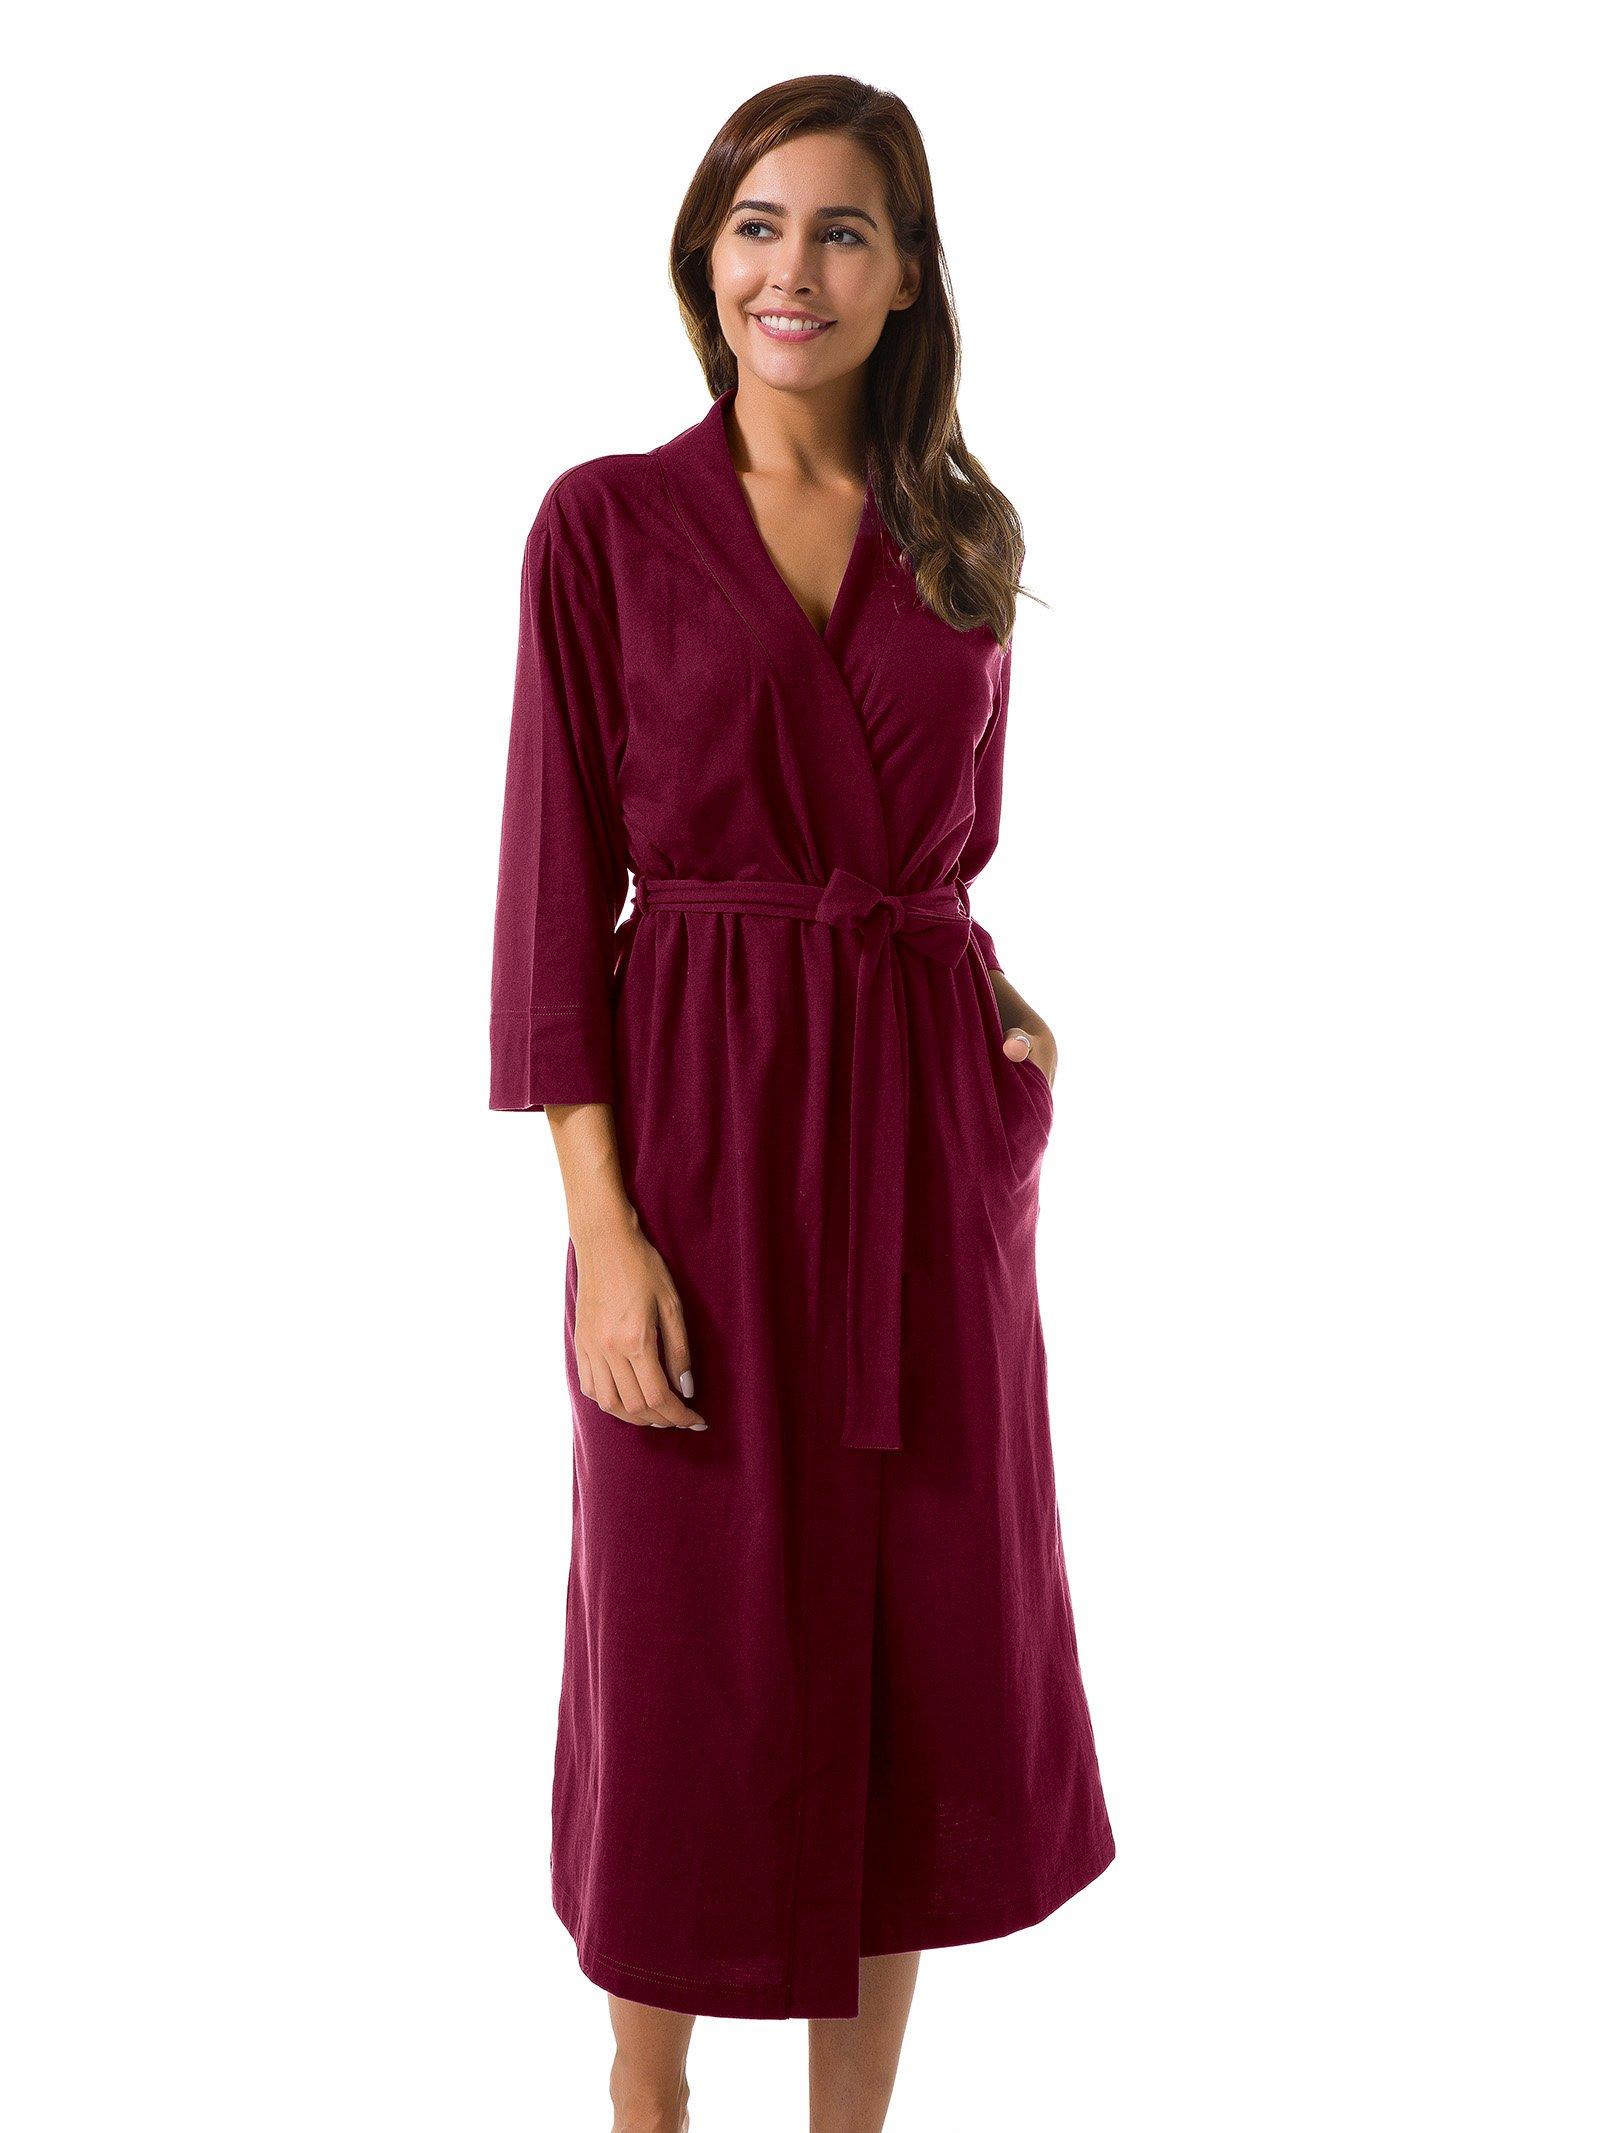 SIORO Cotton Robes Soft Kimono Robe Long Knit Bathrobe Nightwear Lightweight Loungewear Nightdress V-Neck Sexy Sleepwear for Women Burgundy S